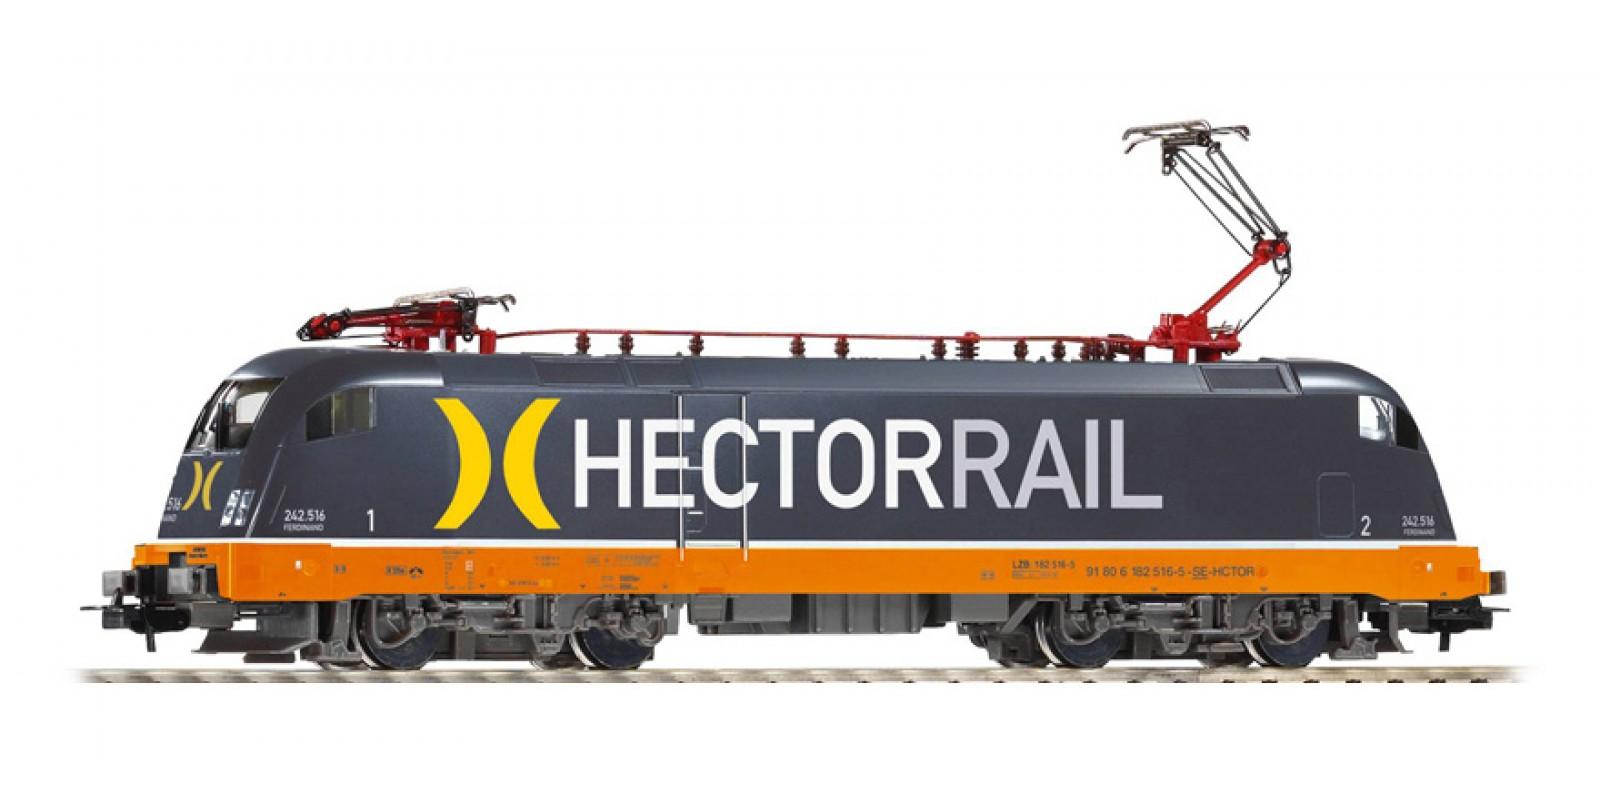 "PI57923 E-Lok ""Taurus"" Rh 242 Hectorrail"